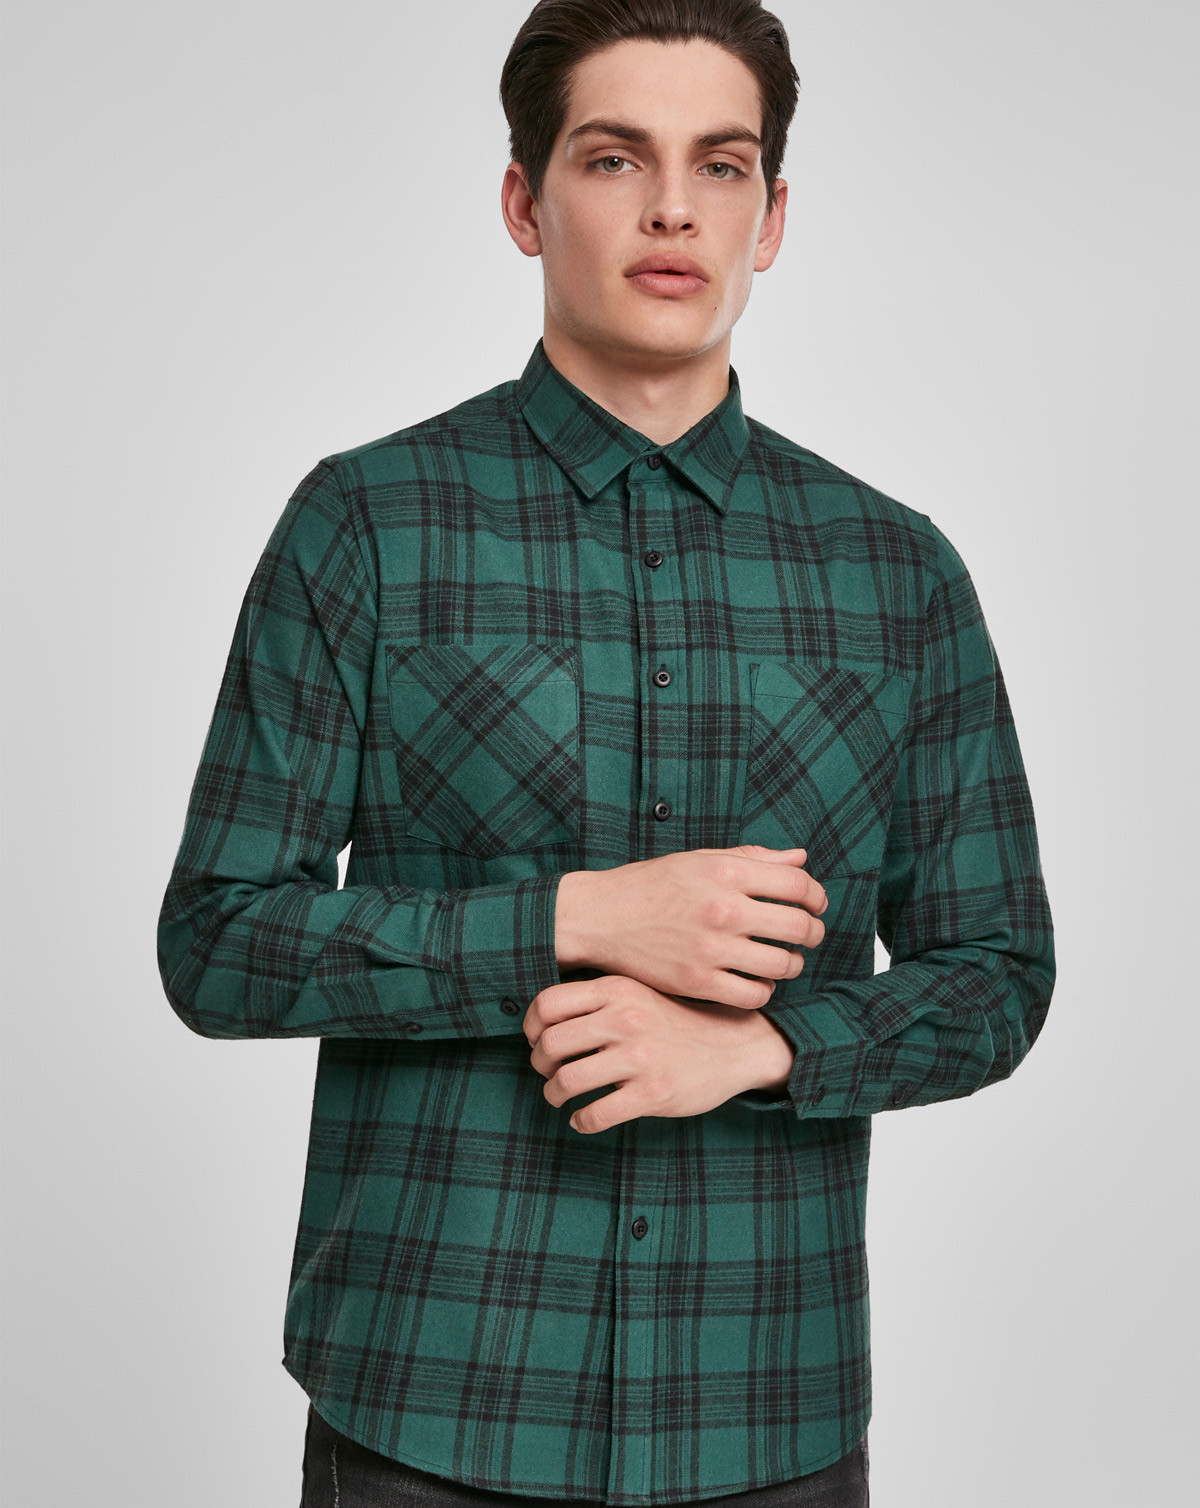 Urban Classics Checked Flanell Shirt 7 (Dark Green / Black, 2XL)